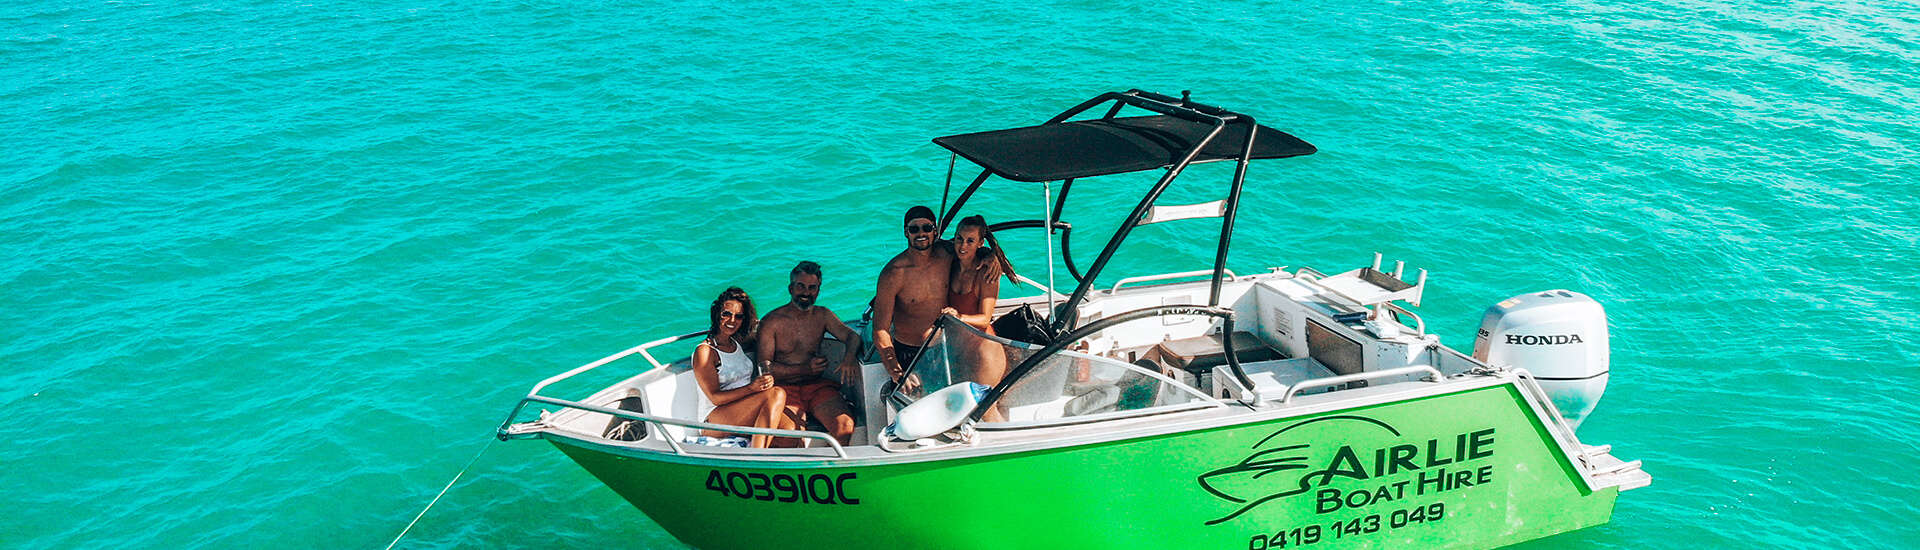 boat-hire-airlie-beach-whitsundays-fishing